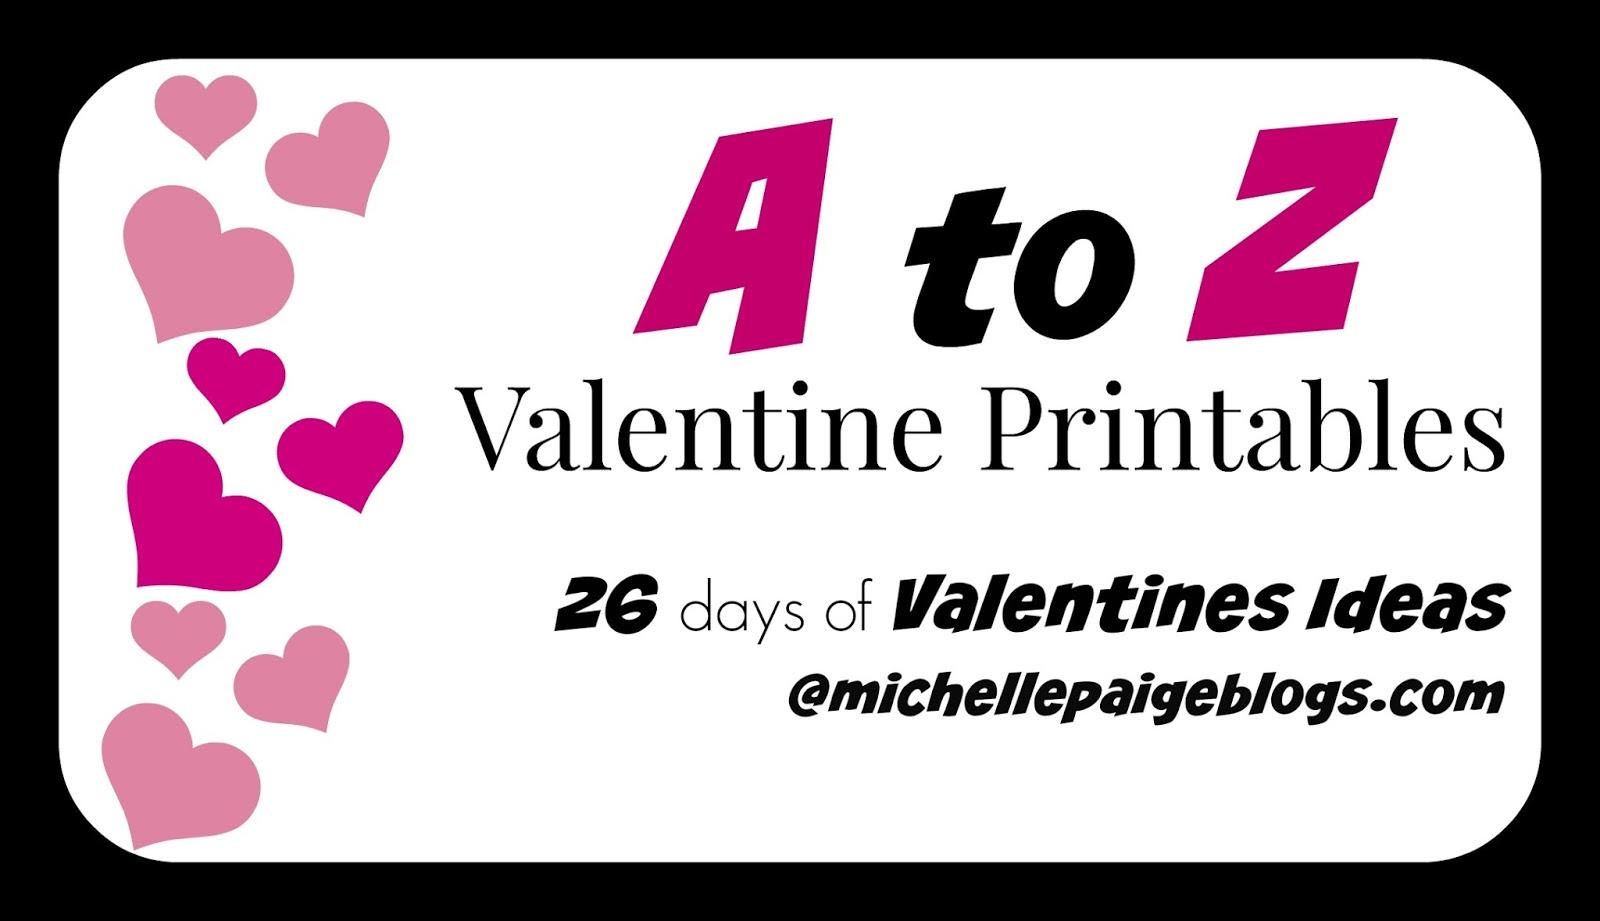 michelle paige blogs: 10 Free Dinosaur Printable Valentines